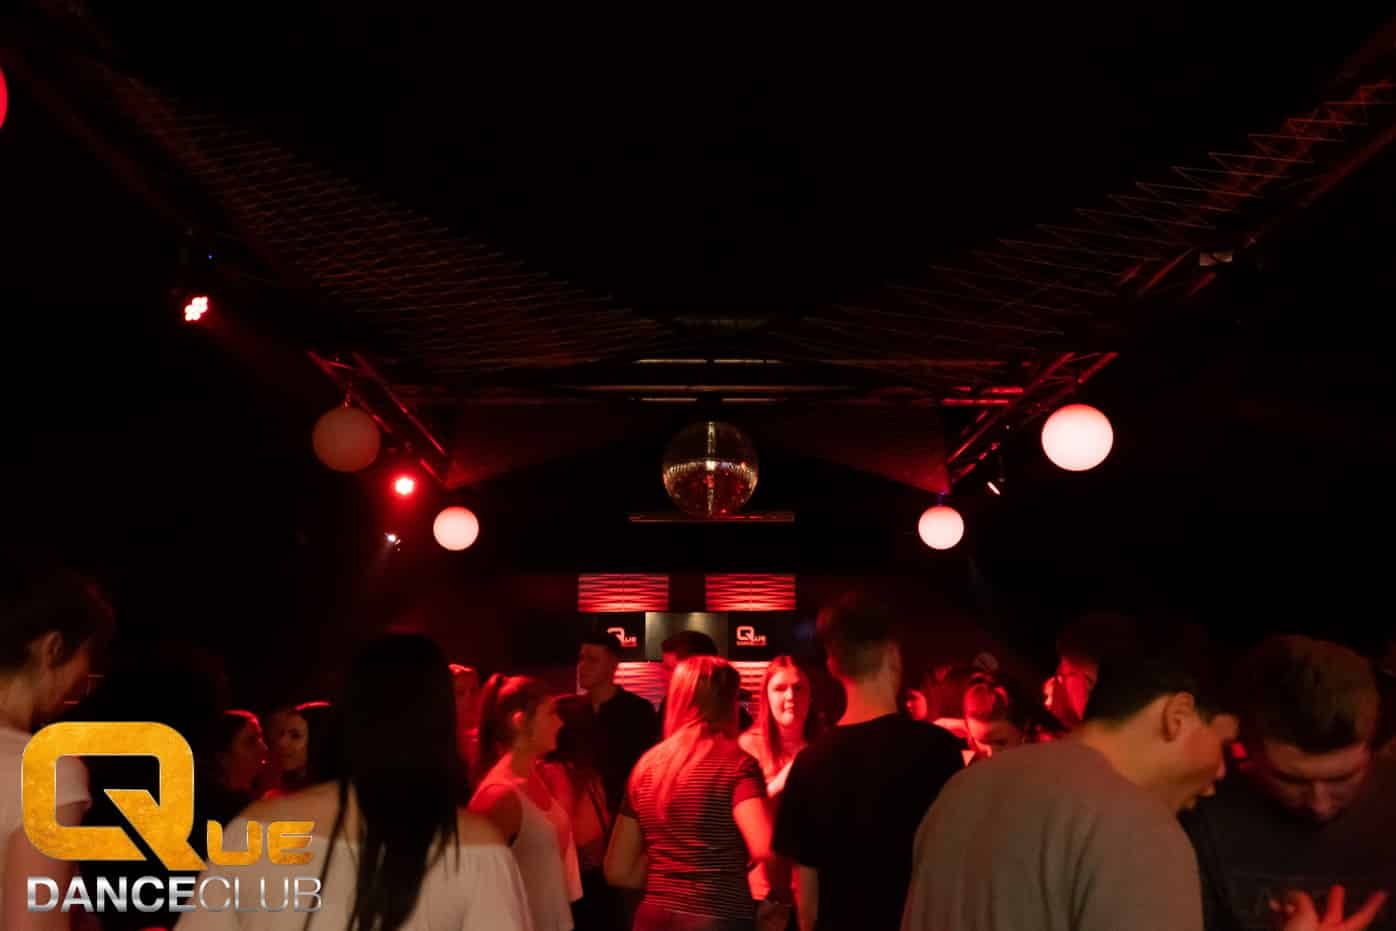 2018_12_20_Que_Danceclub_XMAS_Abiparty_United_Nightlife_Scene_Timo_040